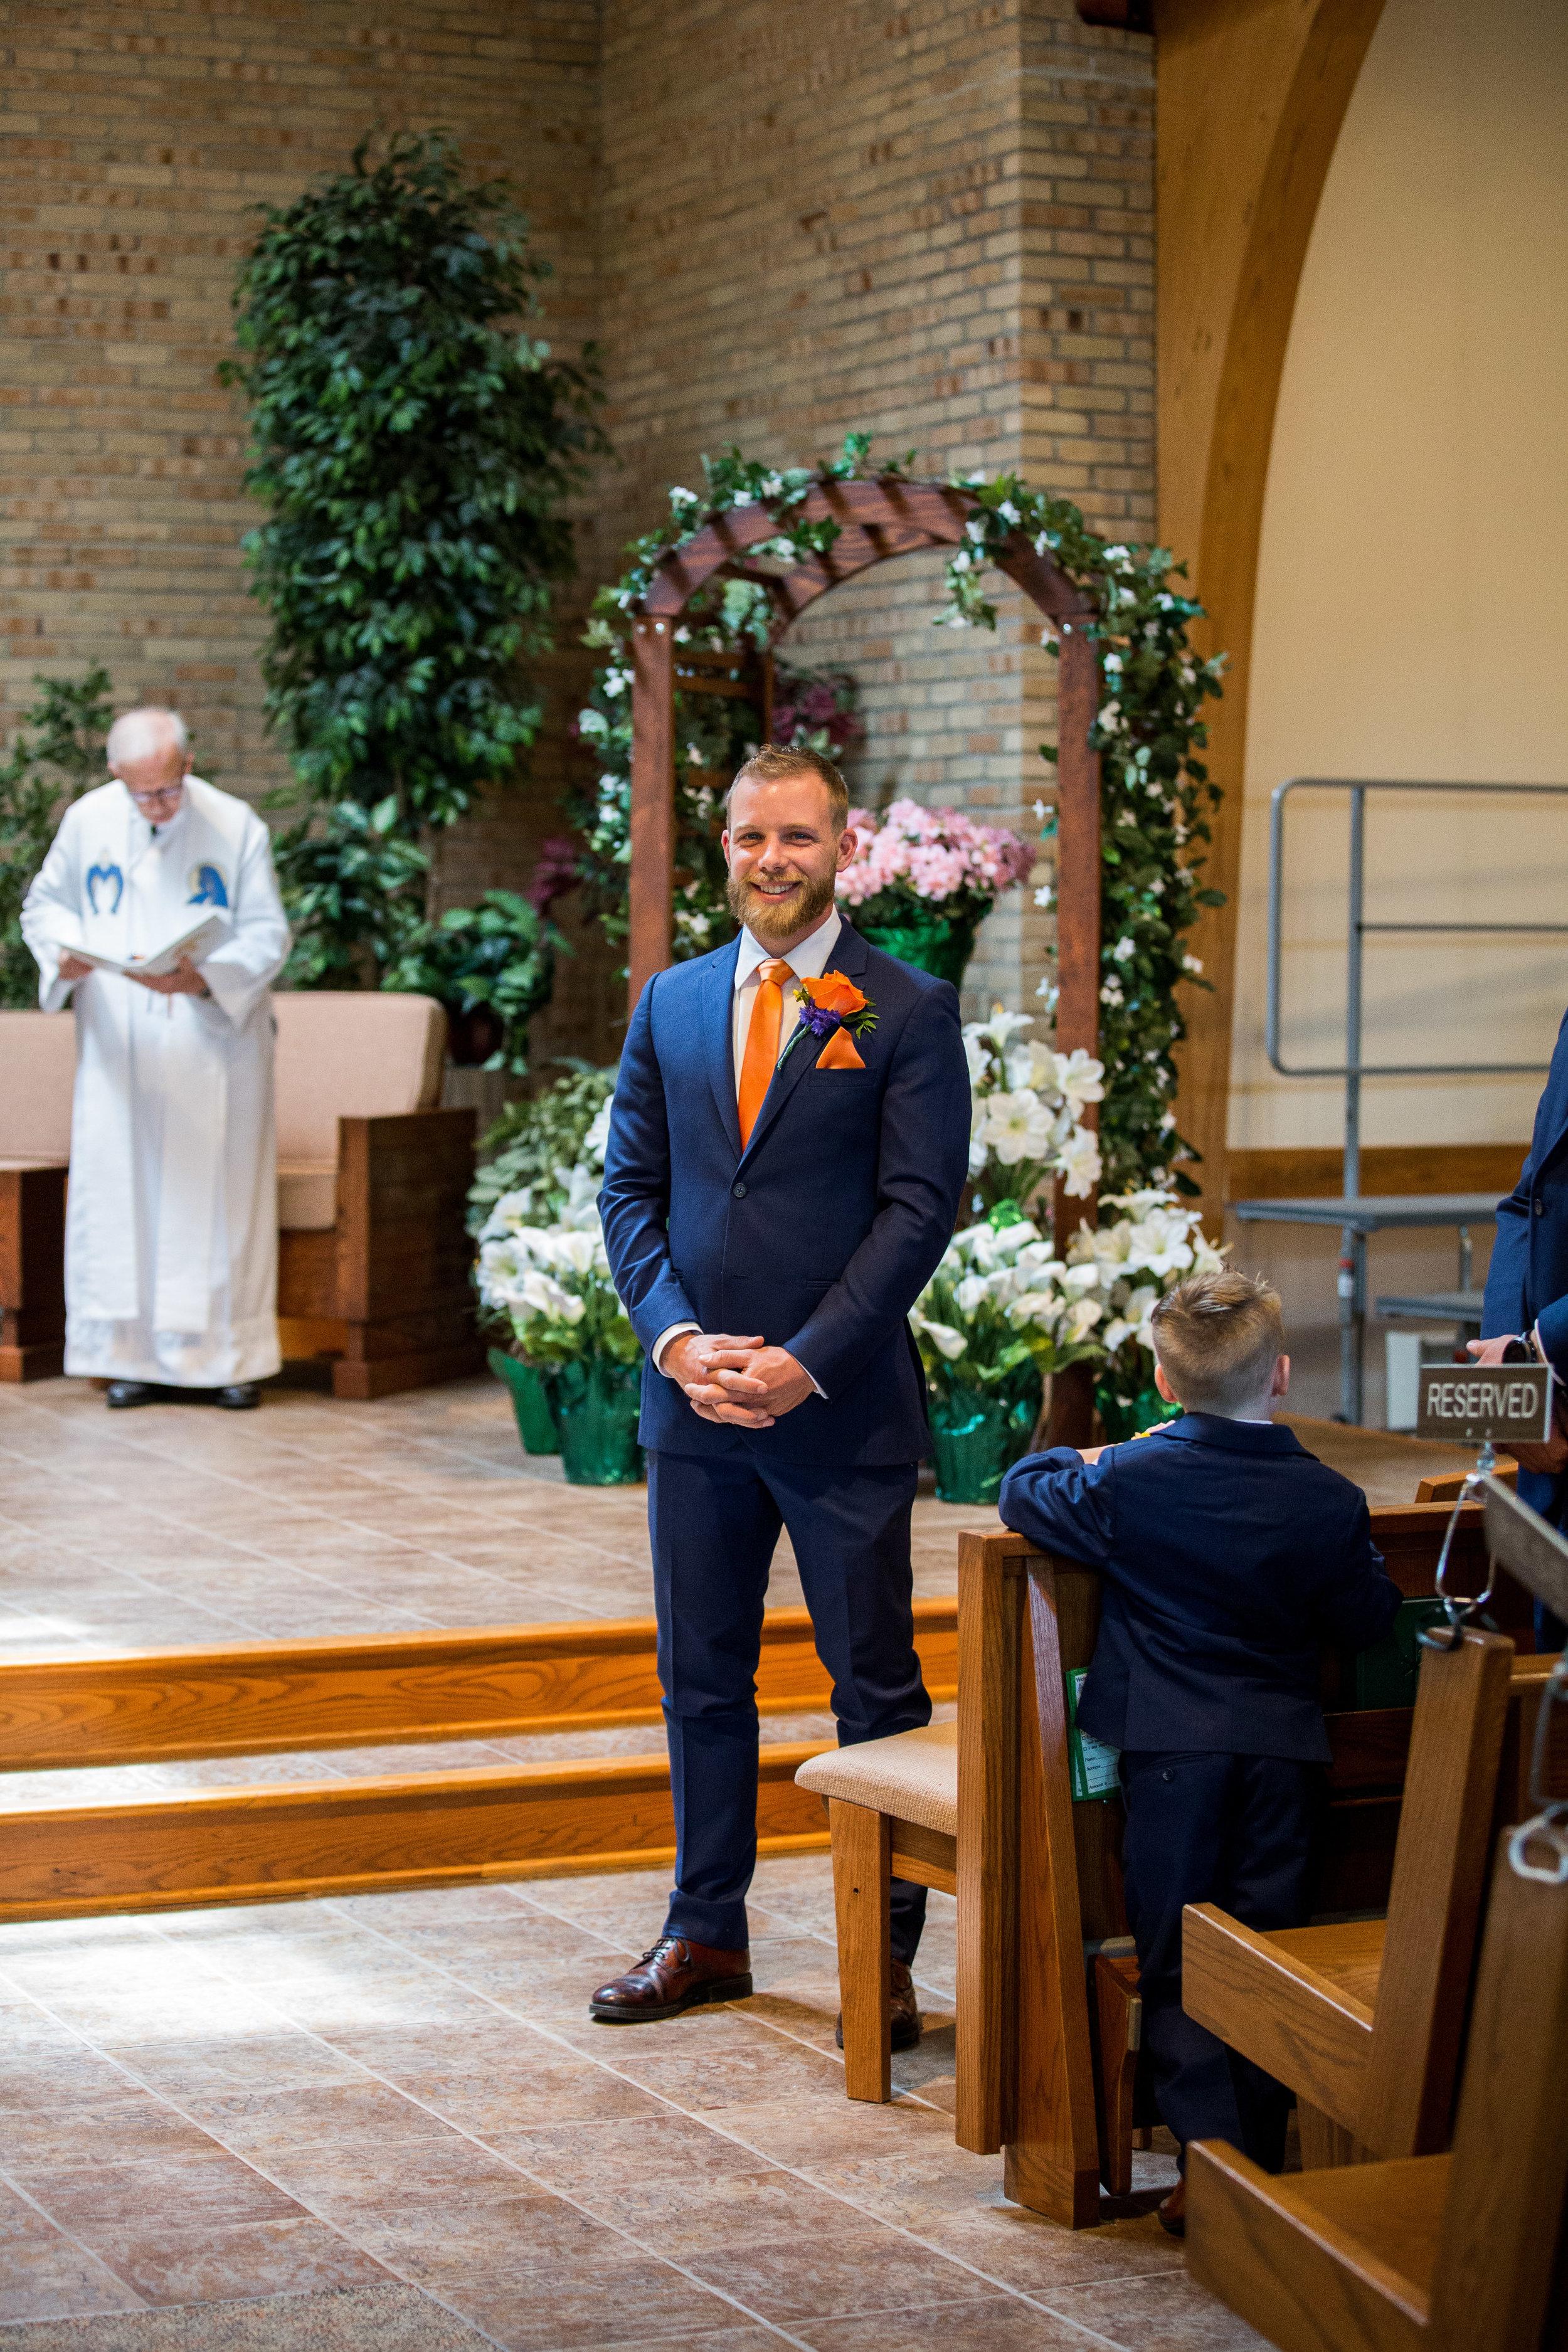 Natalie and Dallas Mooney Wedding 6-8-19_Tania Watt Photography-68.jpg